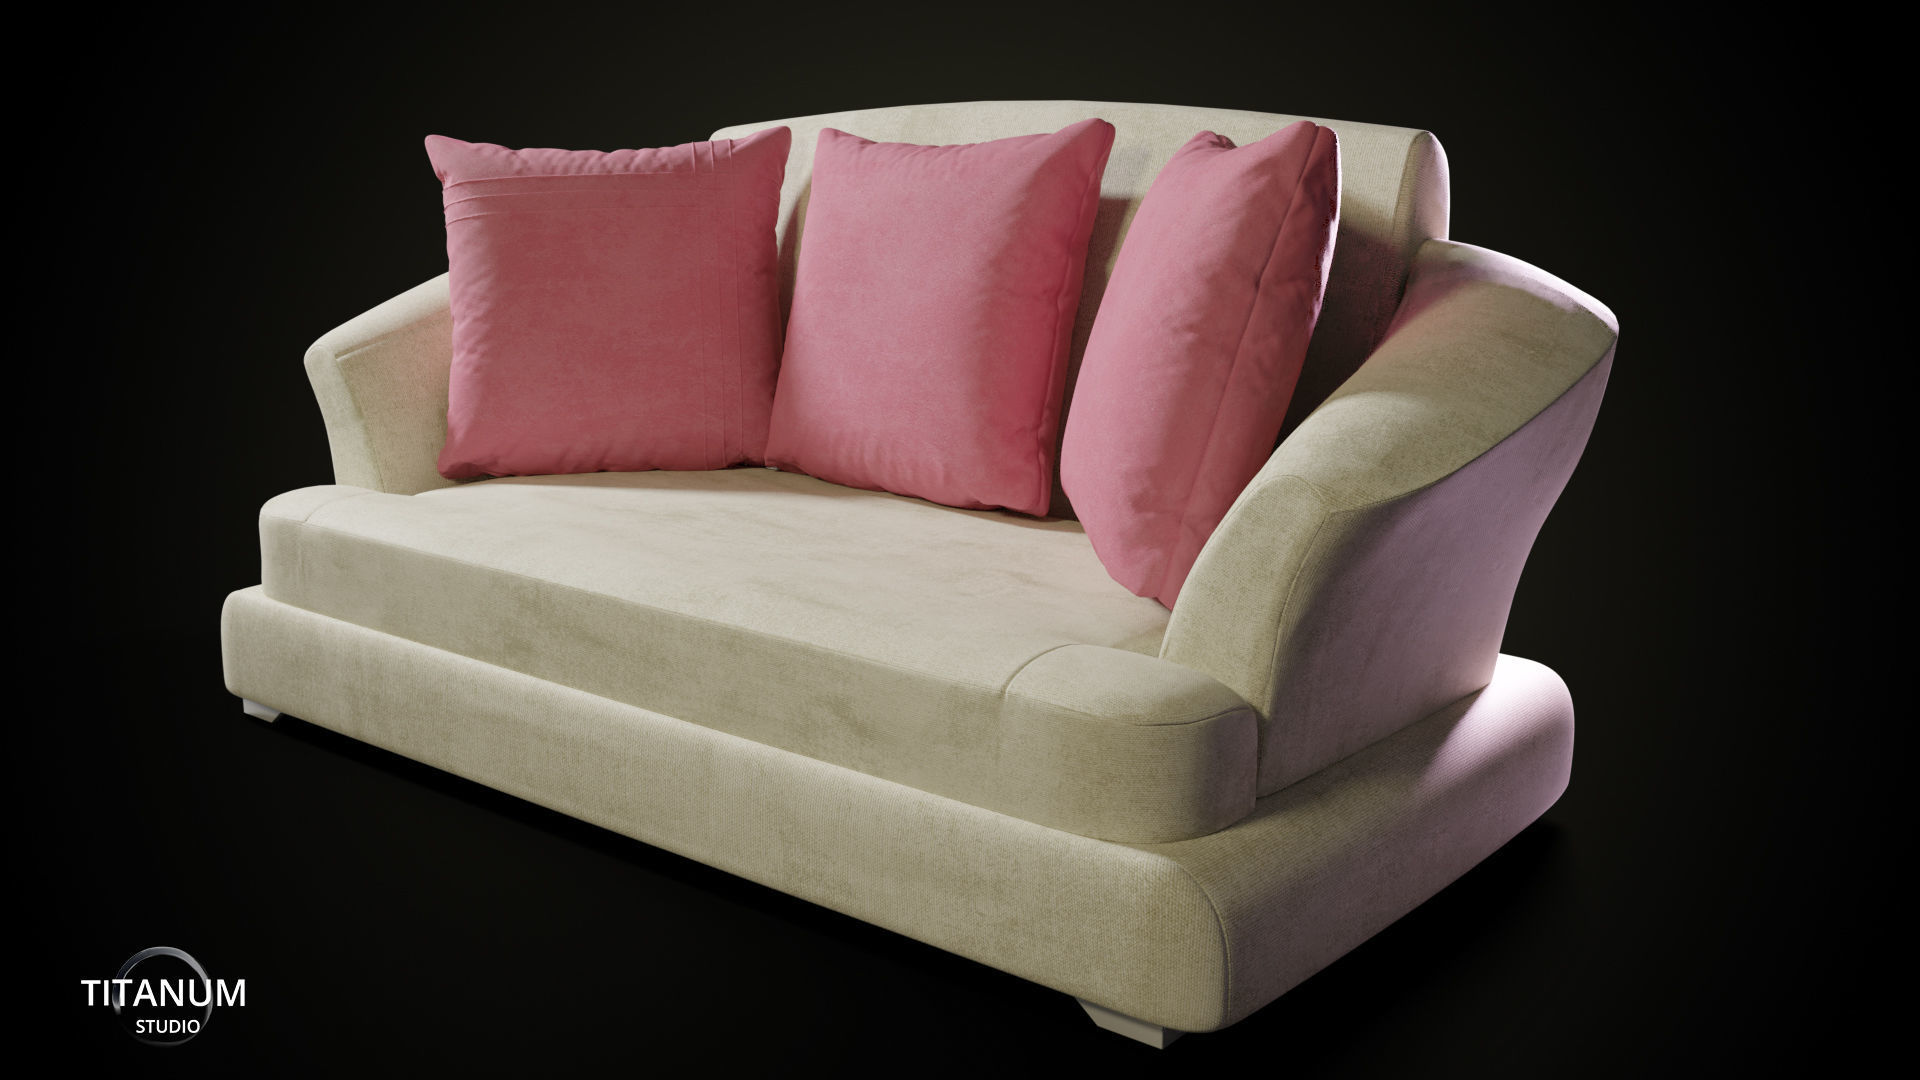 living-room Sofa set 3D model | CGTrader